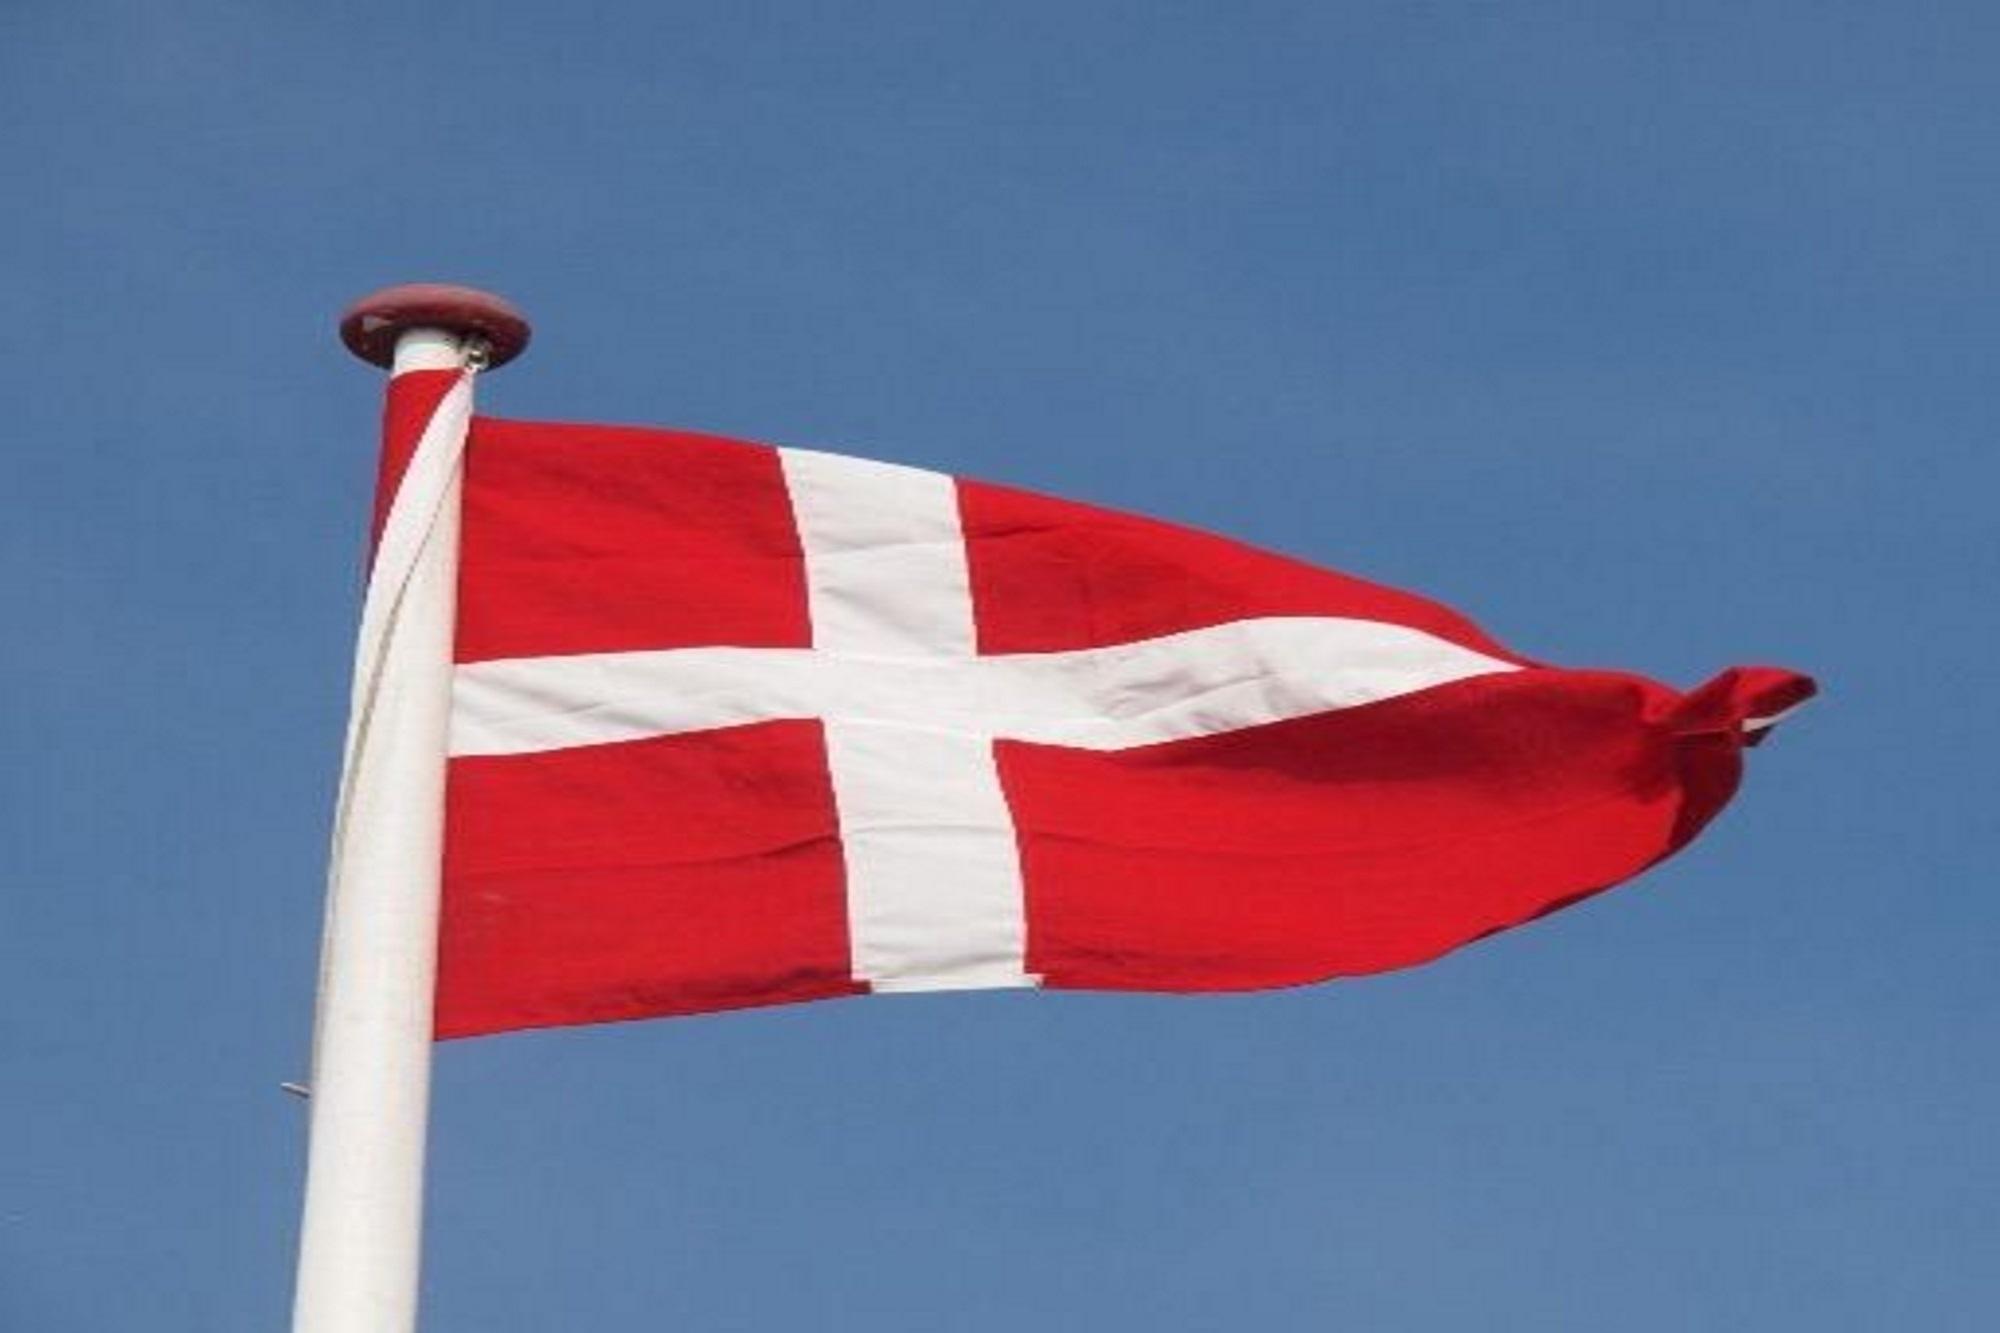 Zahlen 1 10 Kapidaenin Der Dänemarkblog